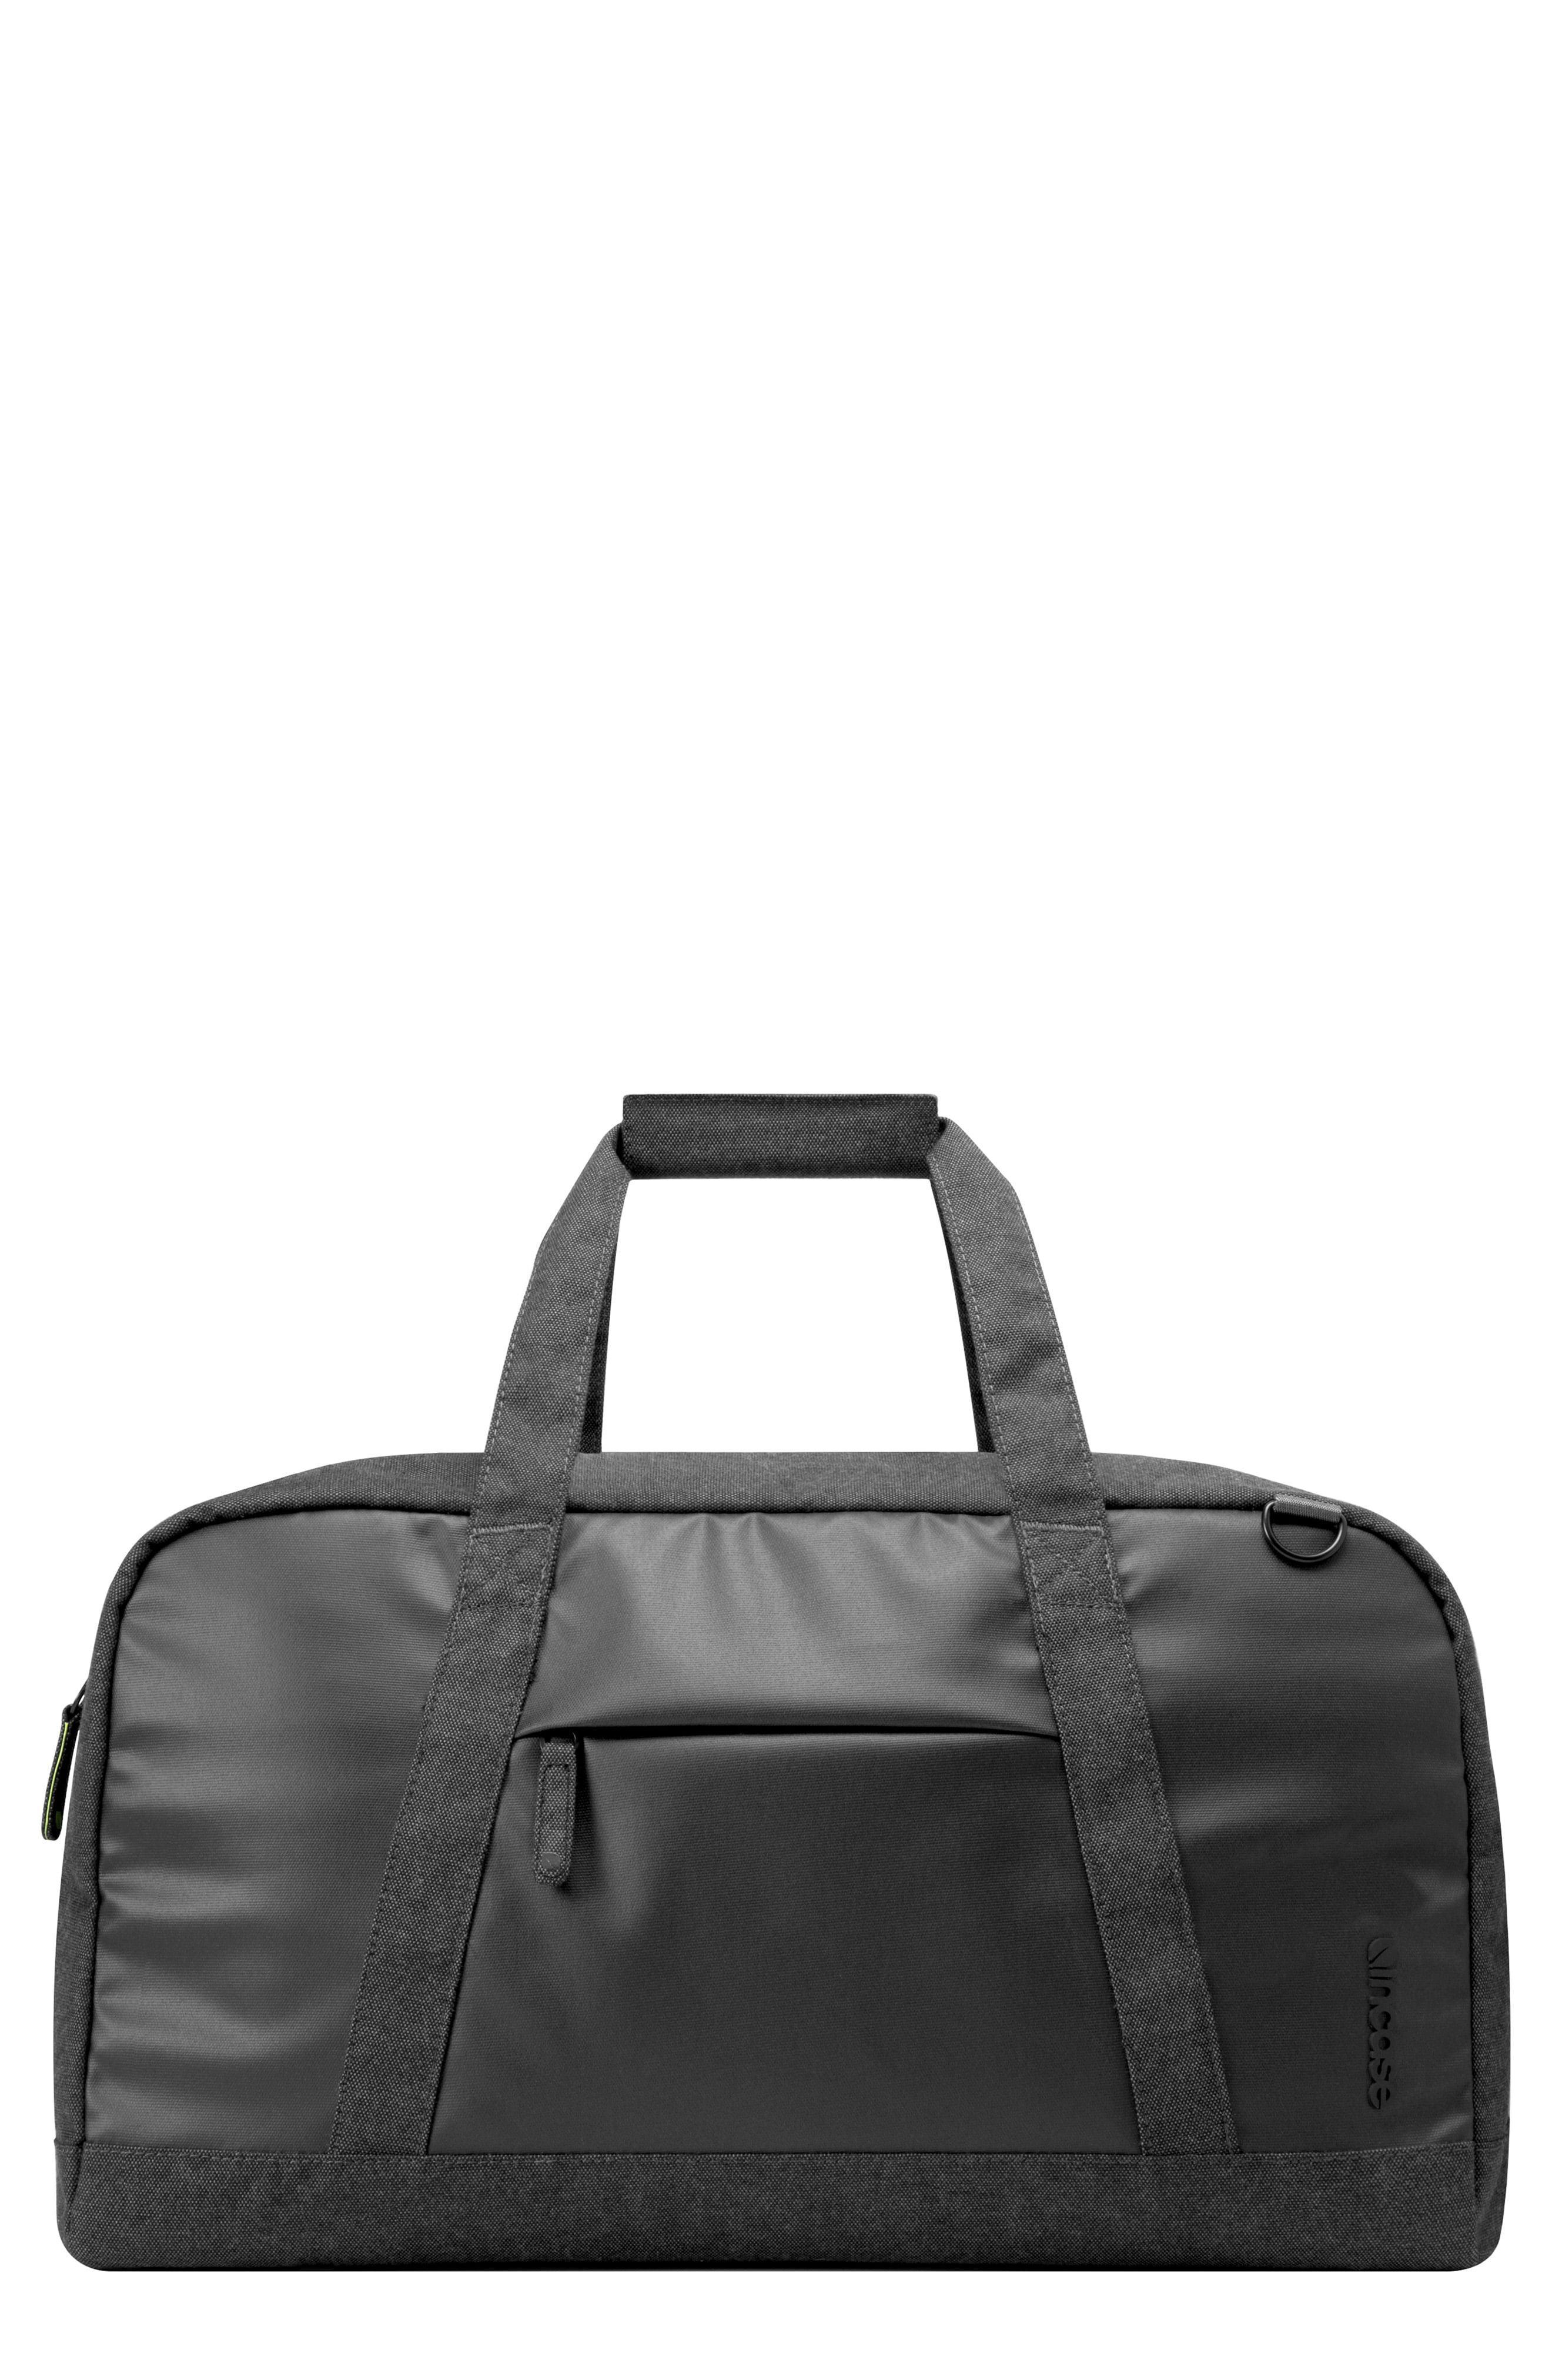 00ee6bc761 Incase - Black Eo Duffel Bag - for Men - Lyst. View fullscreen